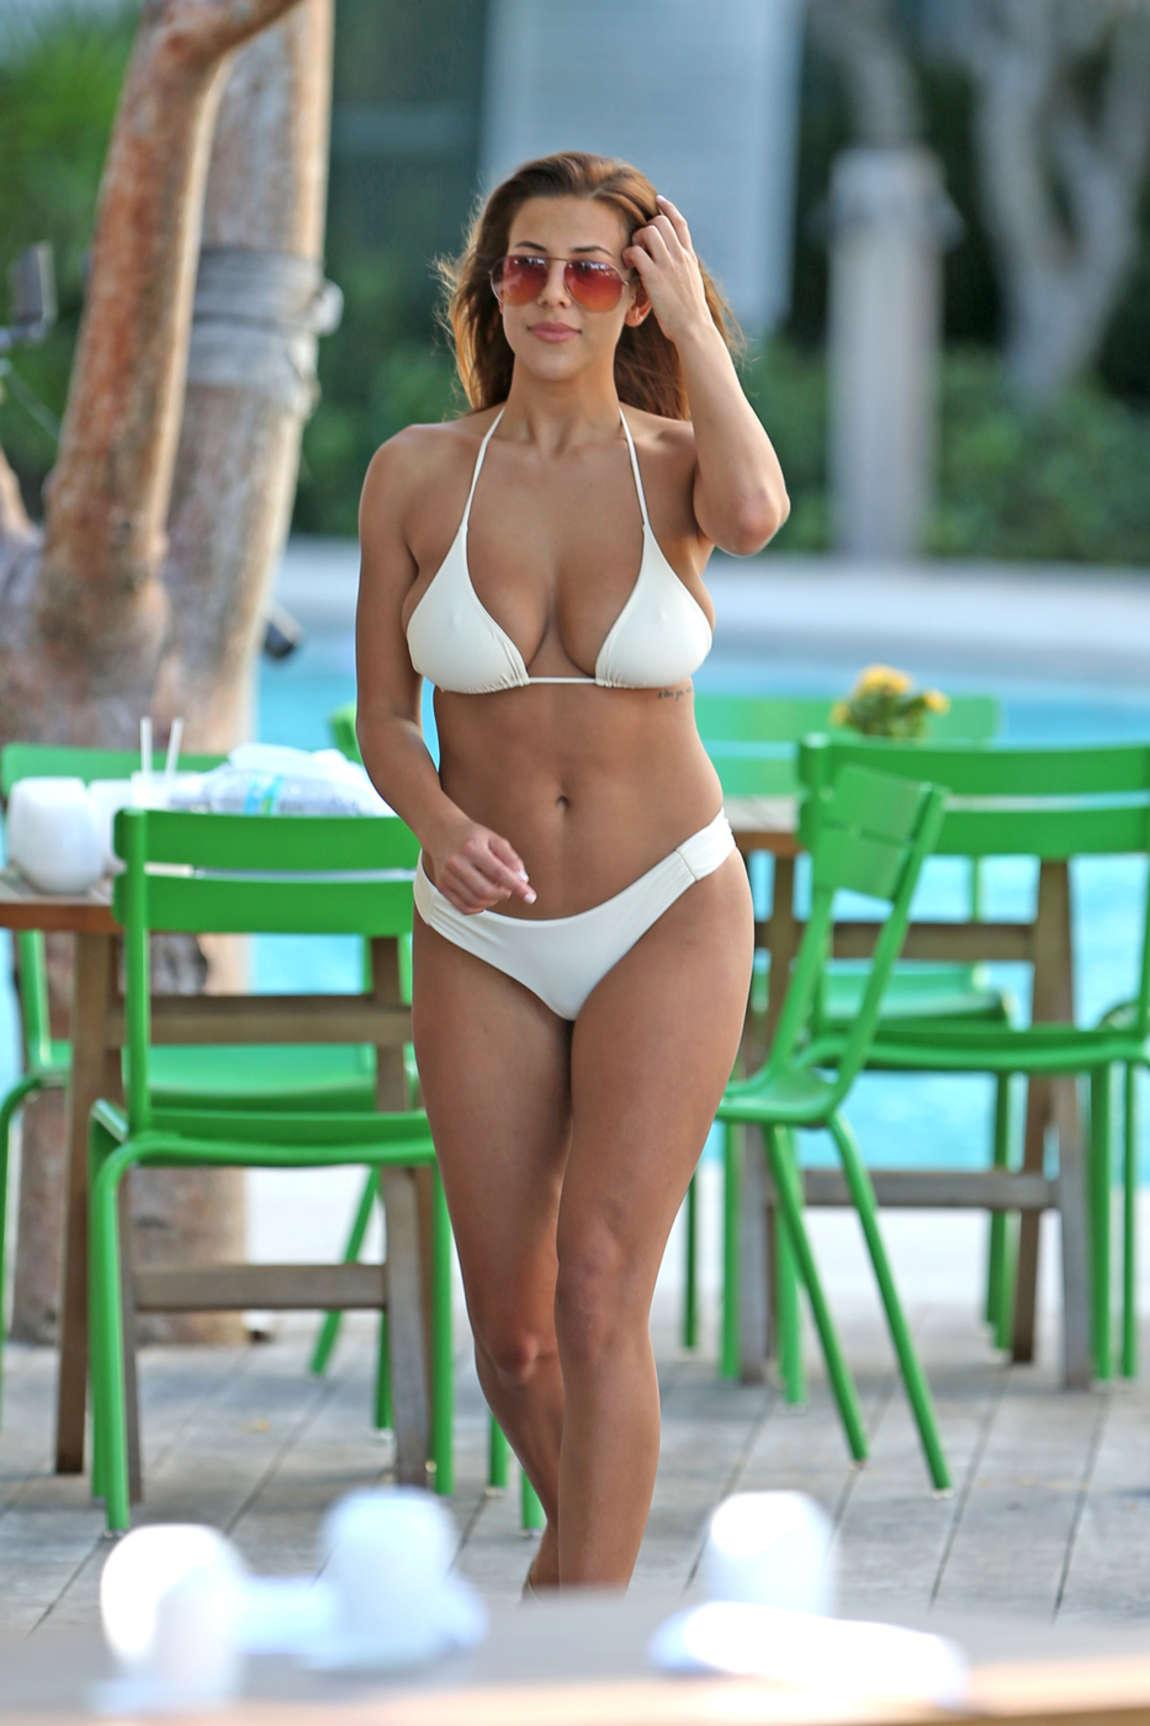 Santa dimopulos bikini nude (96 photo), Bikini Celebrity image